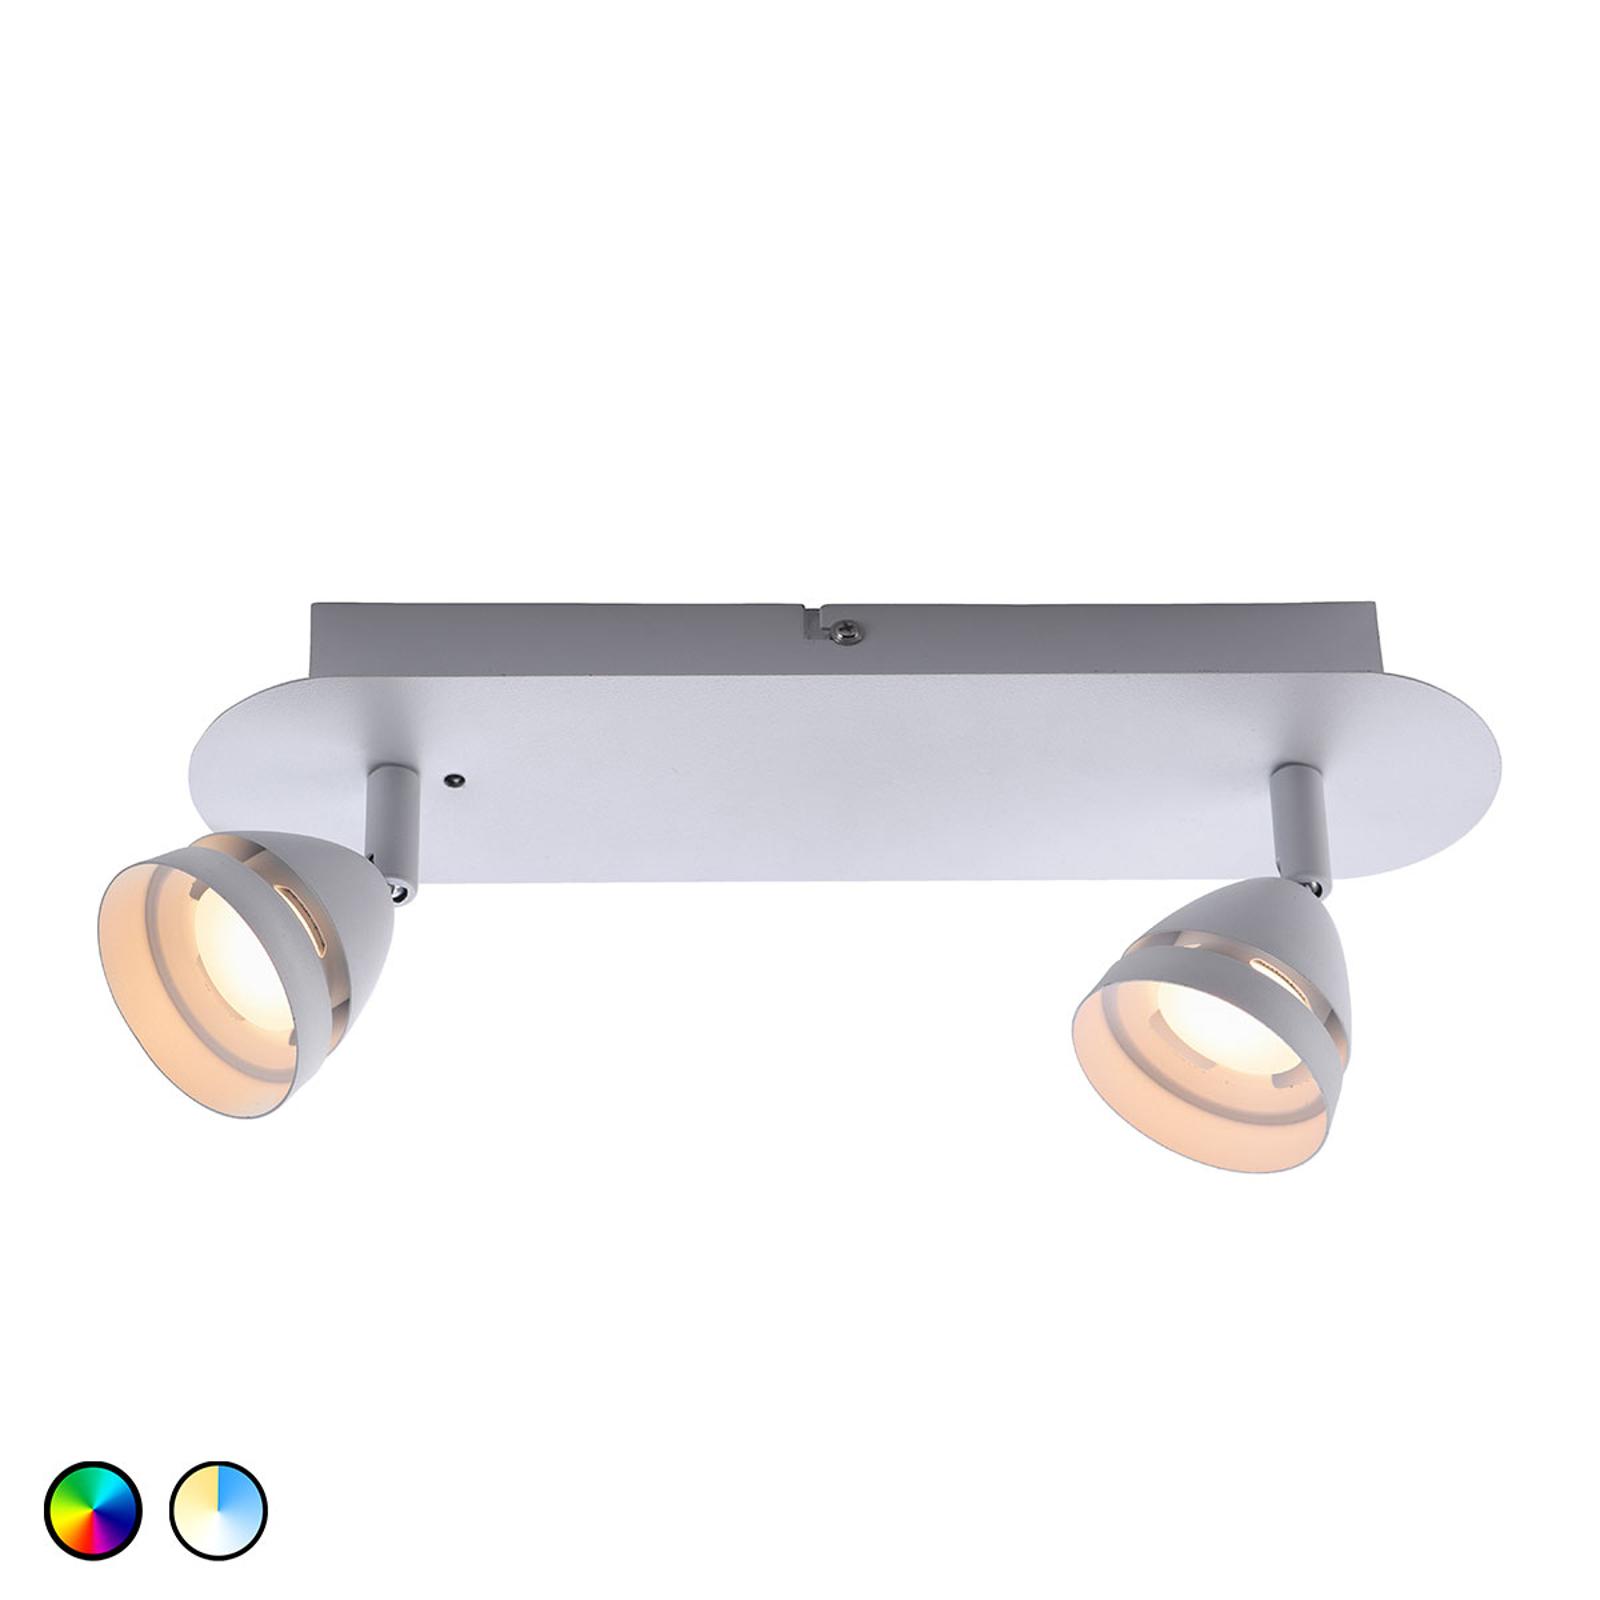 Trio WiZ Gemini LED-Deckenleuchte 2-flg. weiß